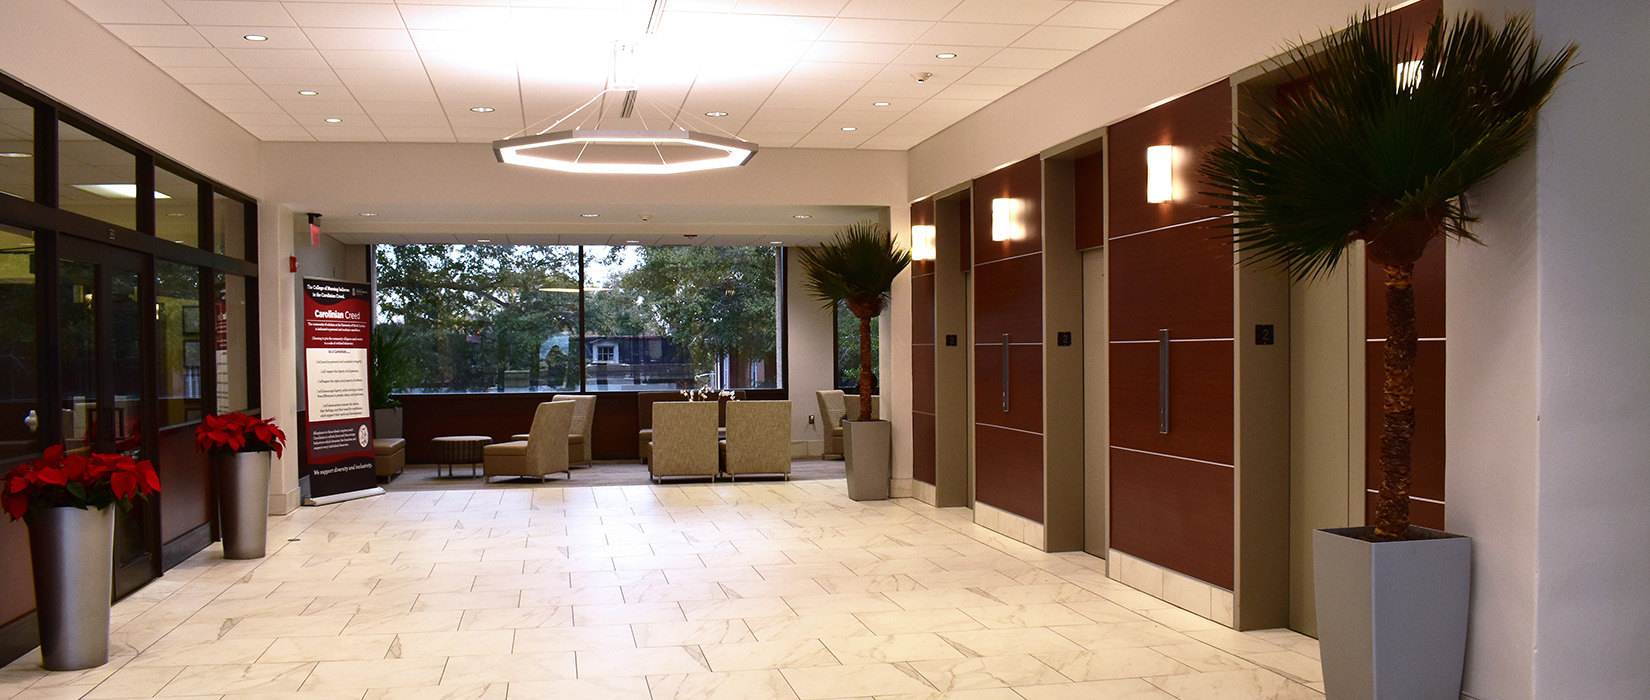 Lobby renovations modernize the College of Nursing